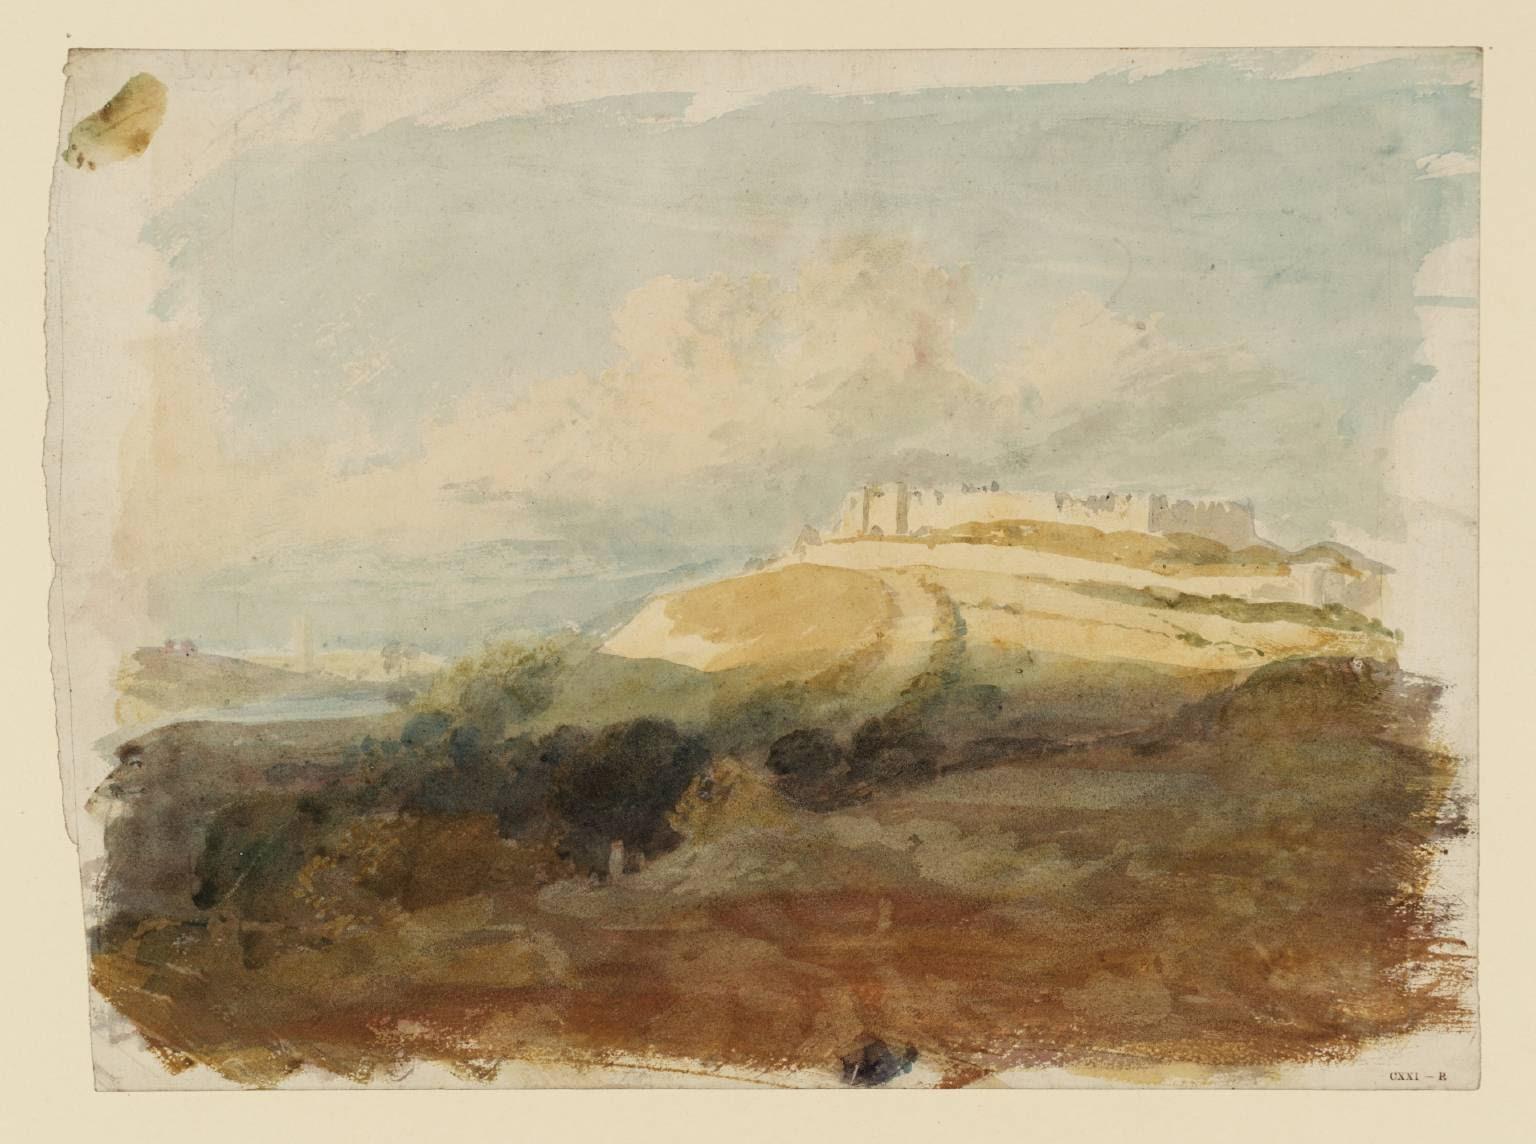 Acuarela de Turner